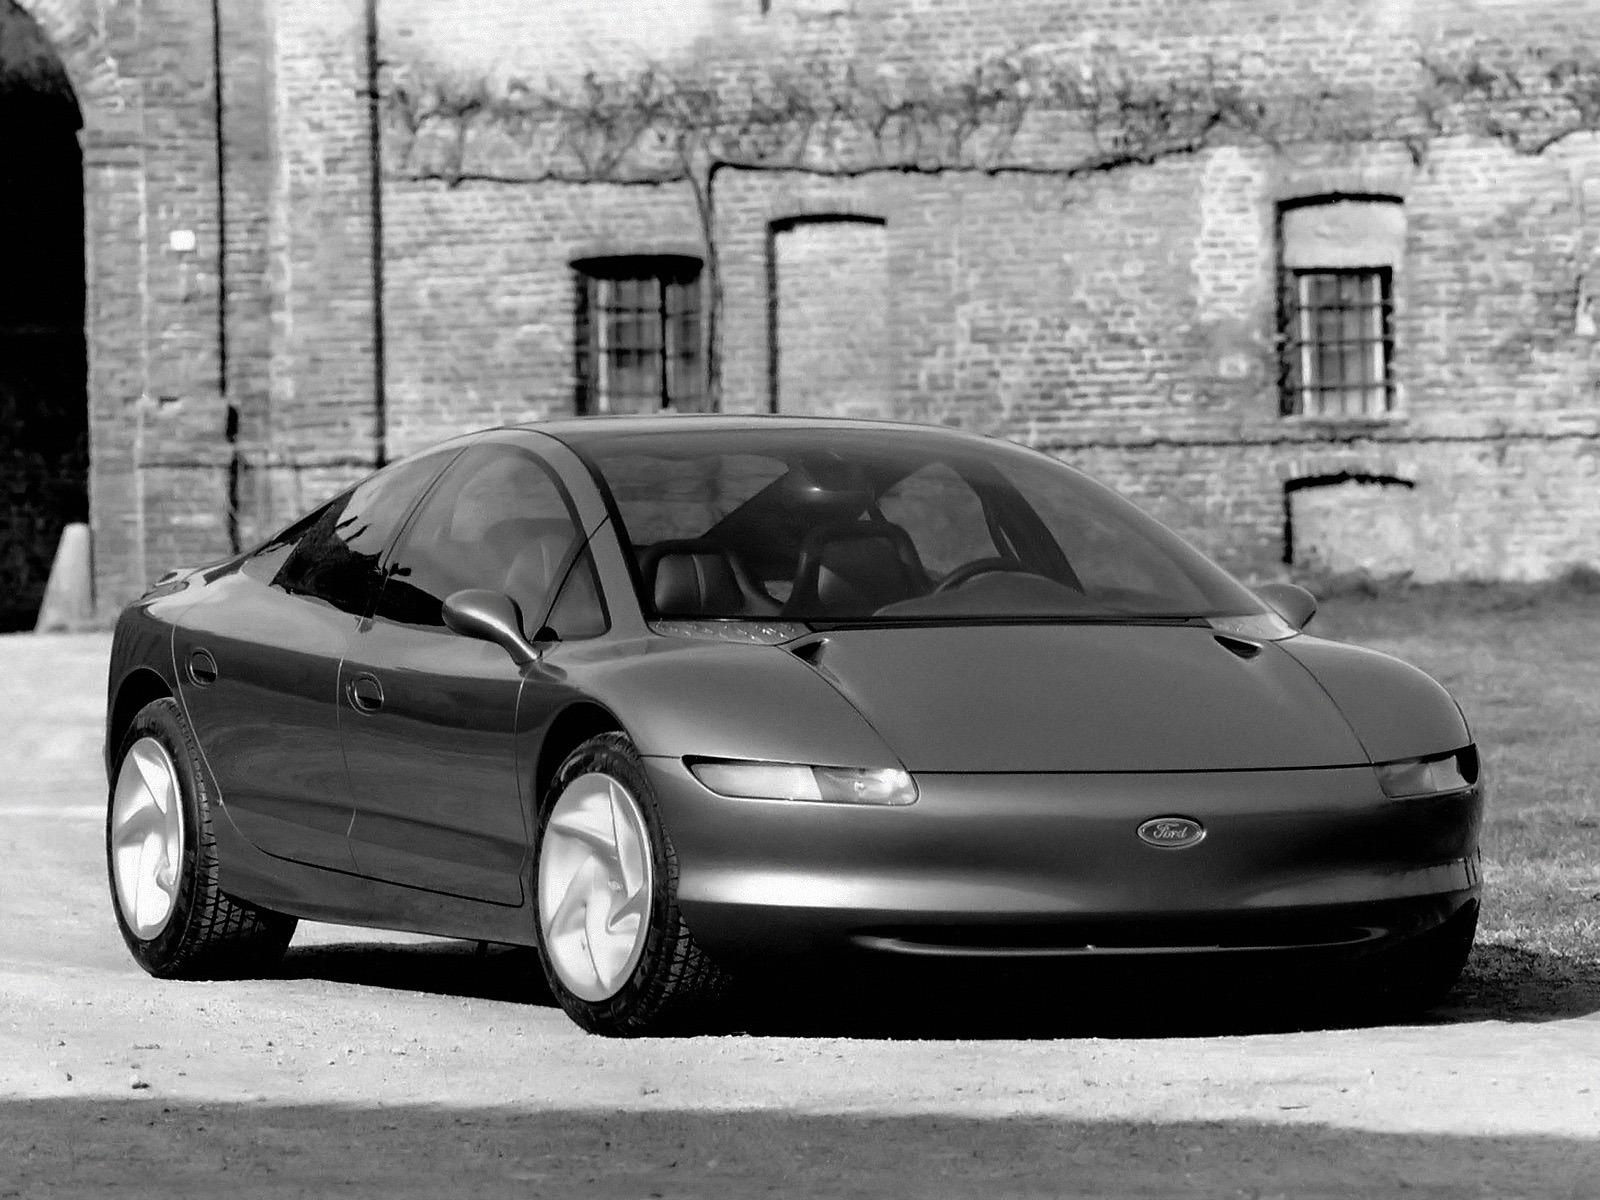 1989-Ghia-Ford-Via-Concept-02